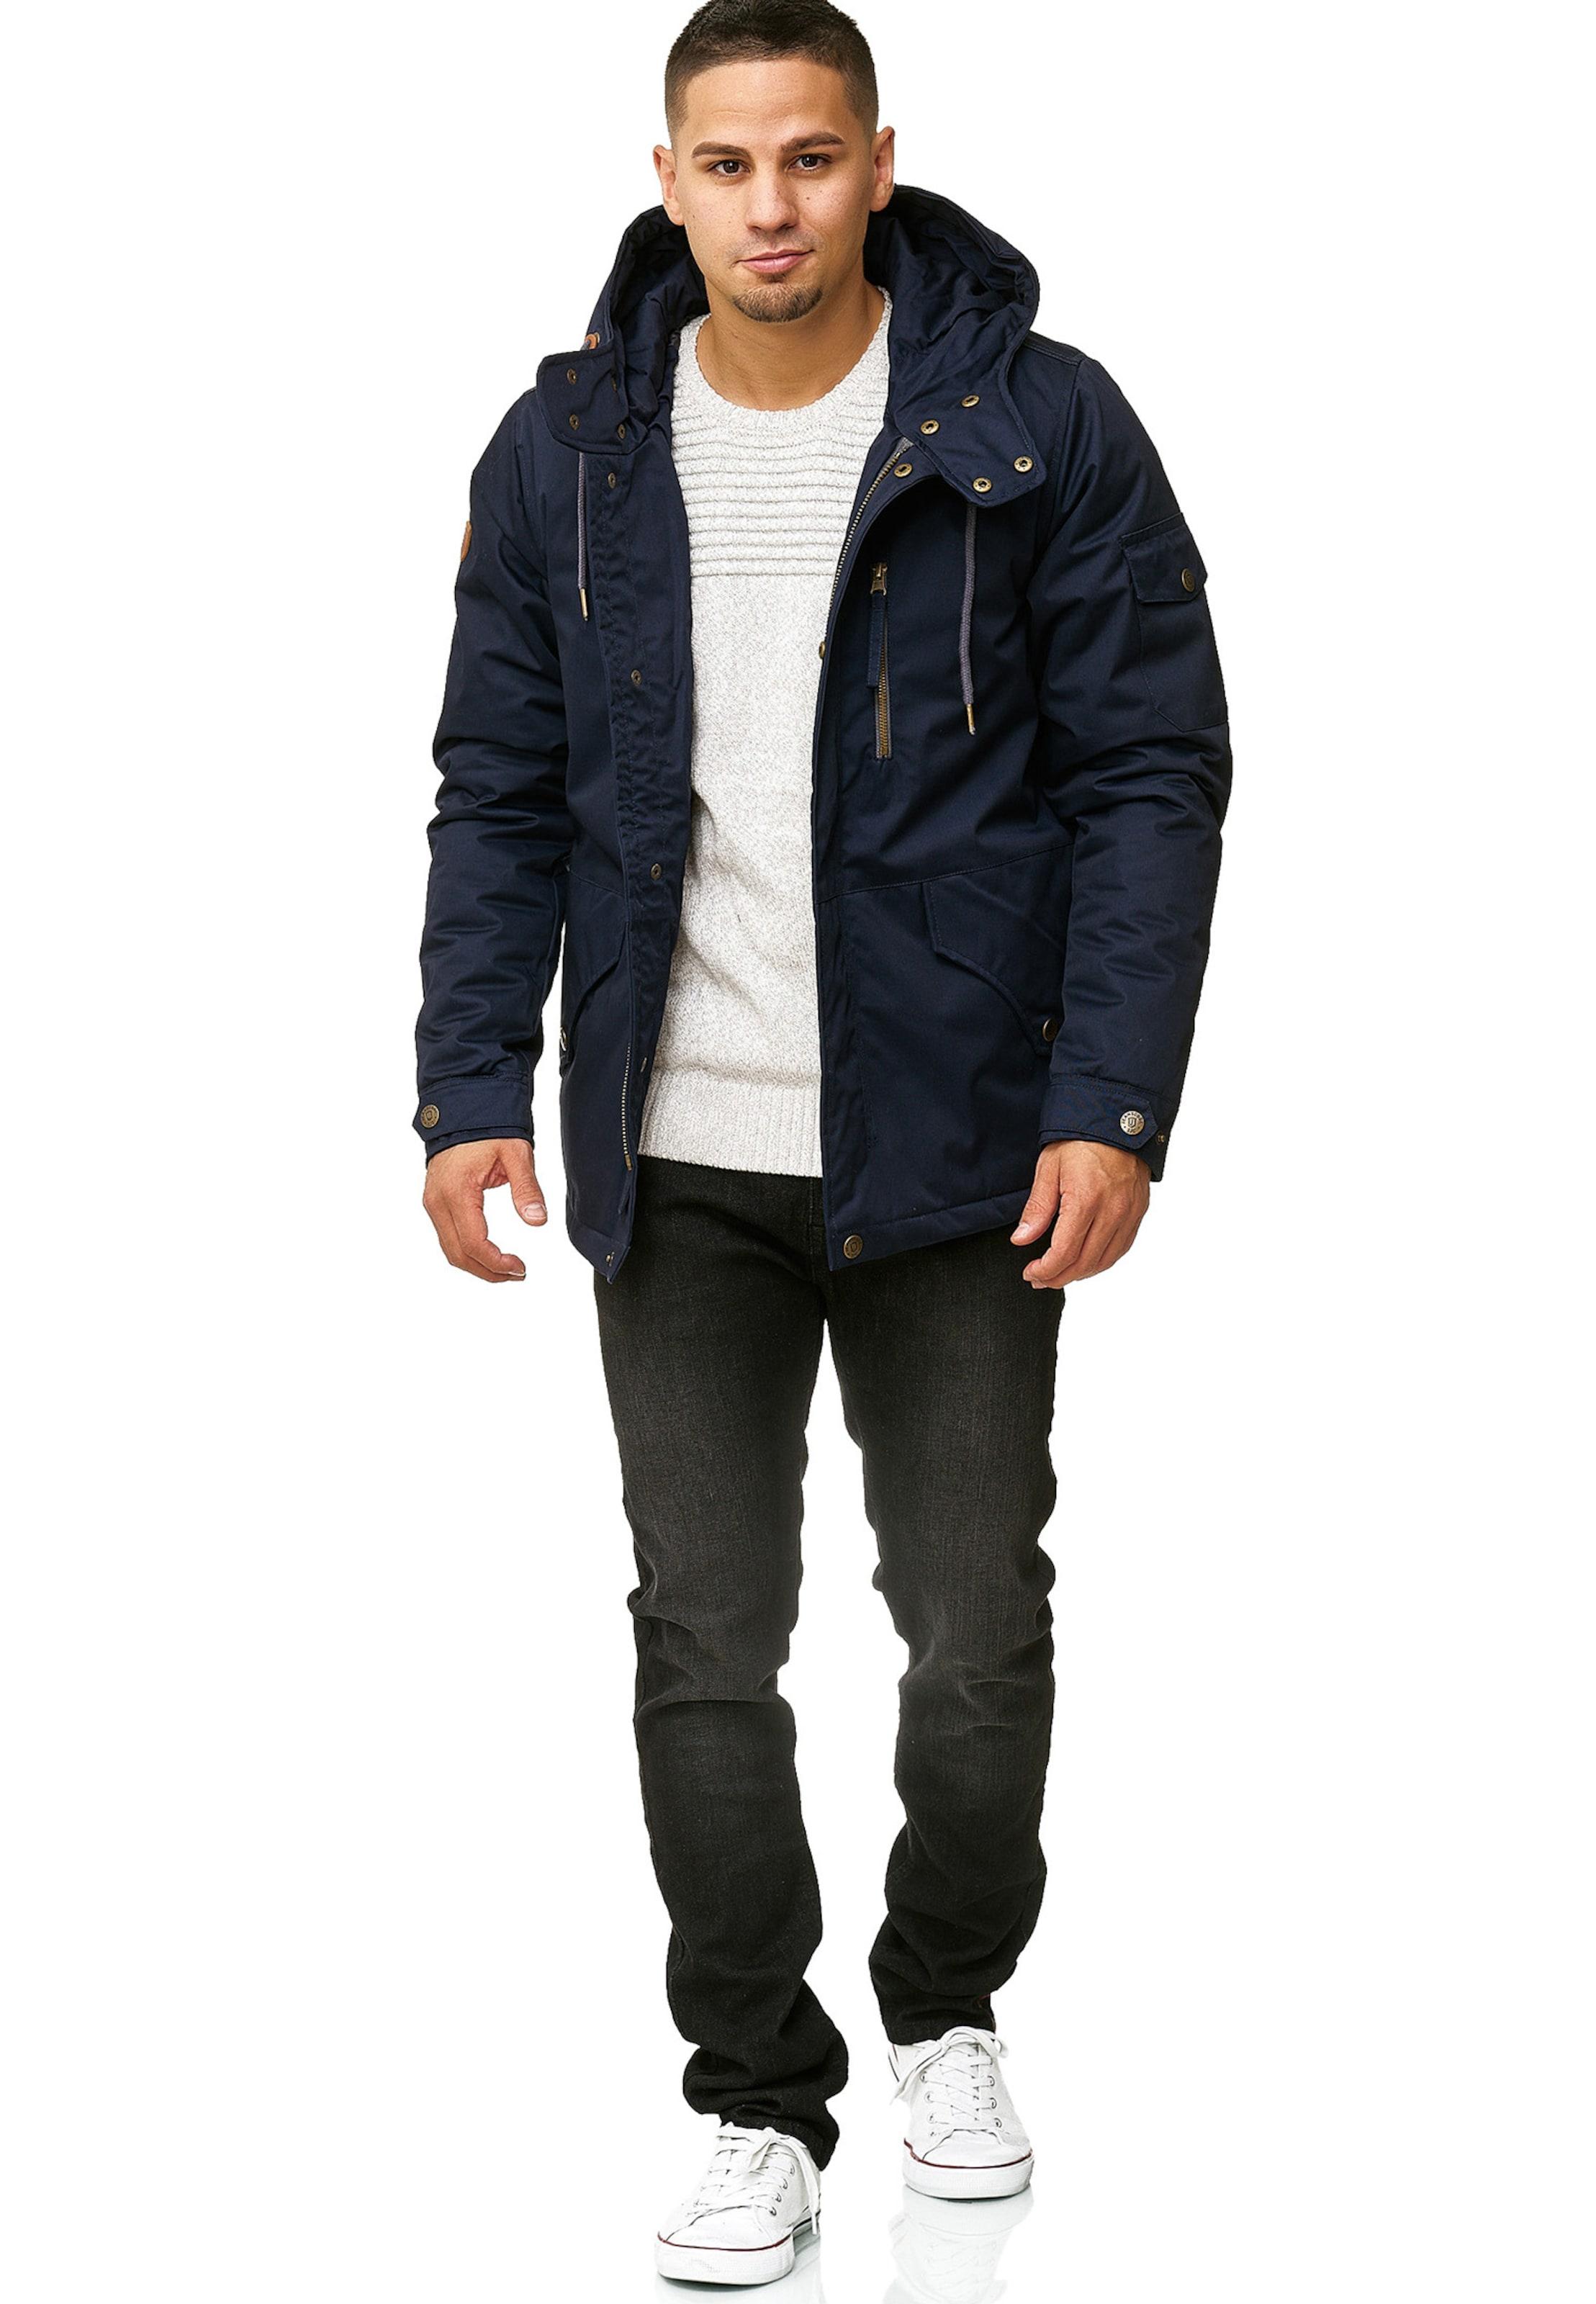 Indicode Marine Jeans D'hiver 'elmhurts' En Bleu Veste IY7gyvmbf6